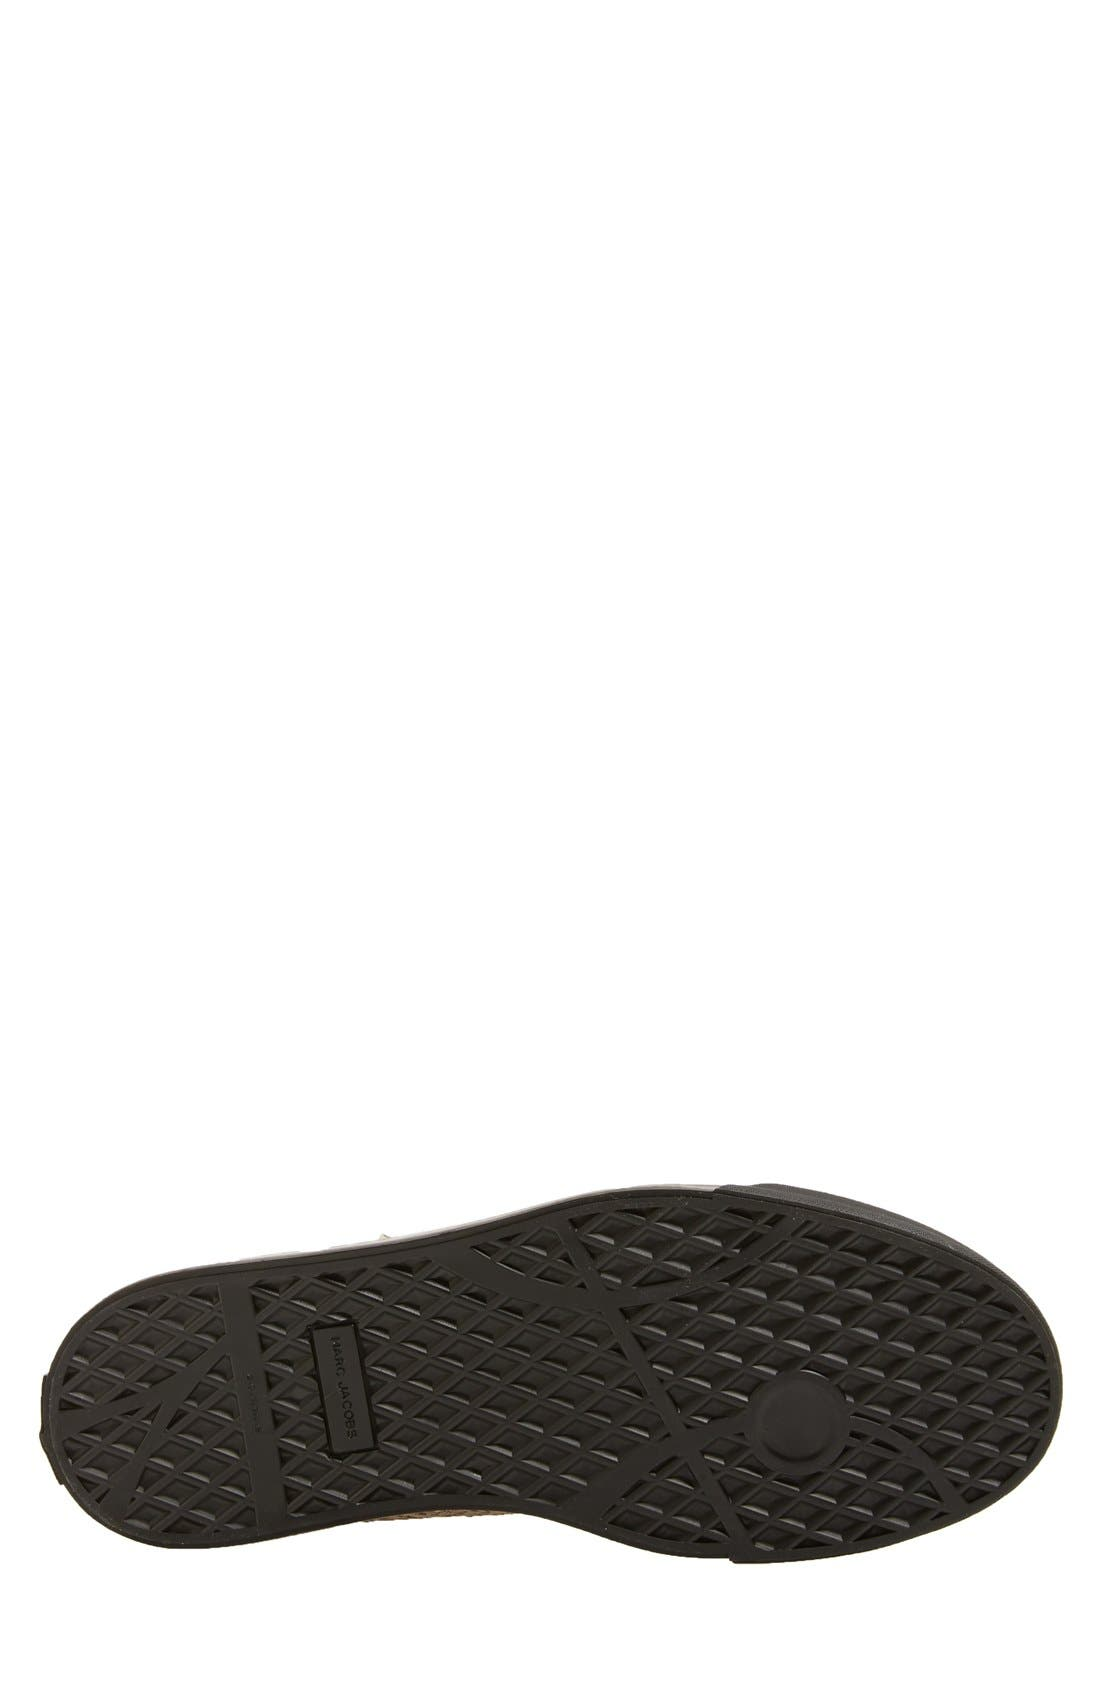 'Atomic Zip' Snake Print High Top Sneaker,                             Alternate thumbnail 4, color,                             001